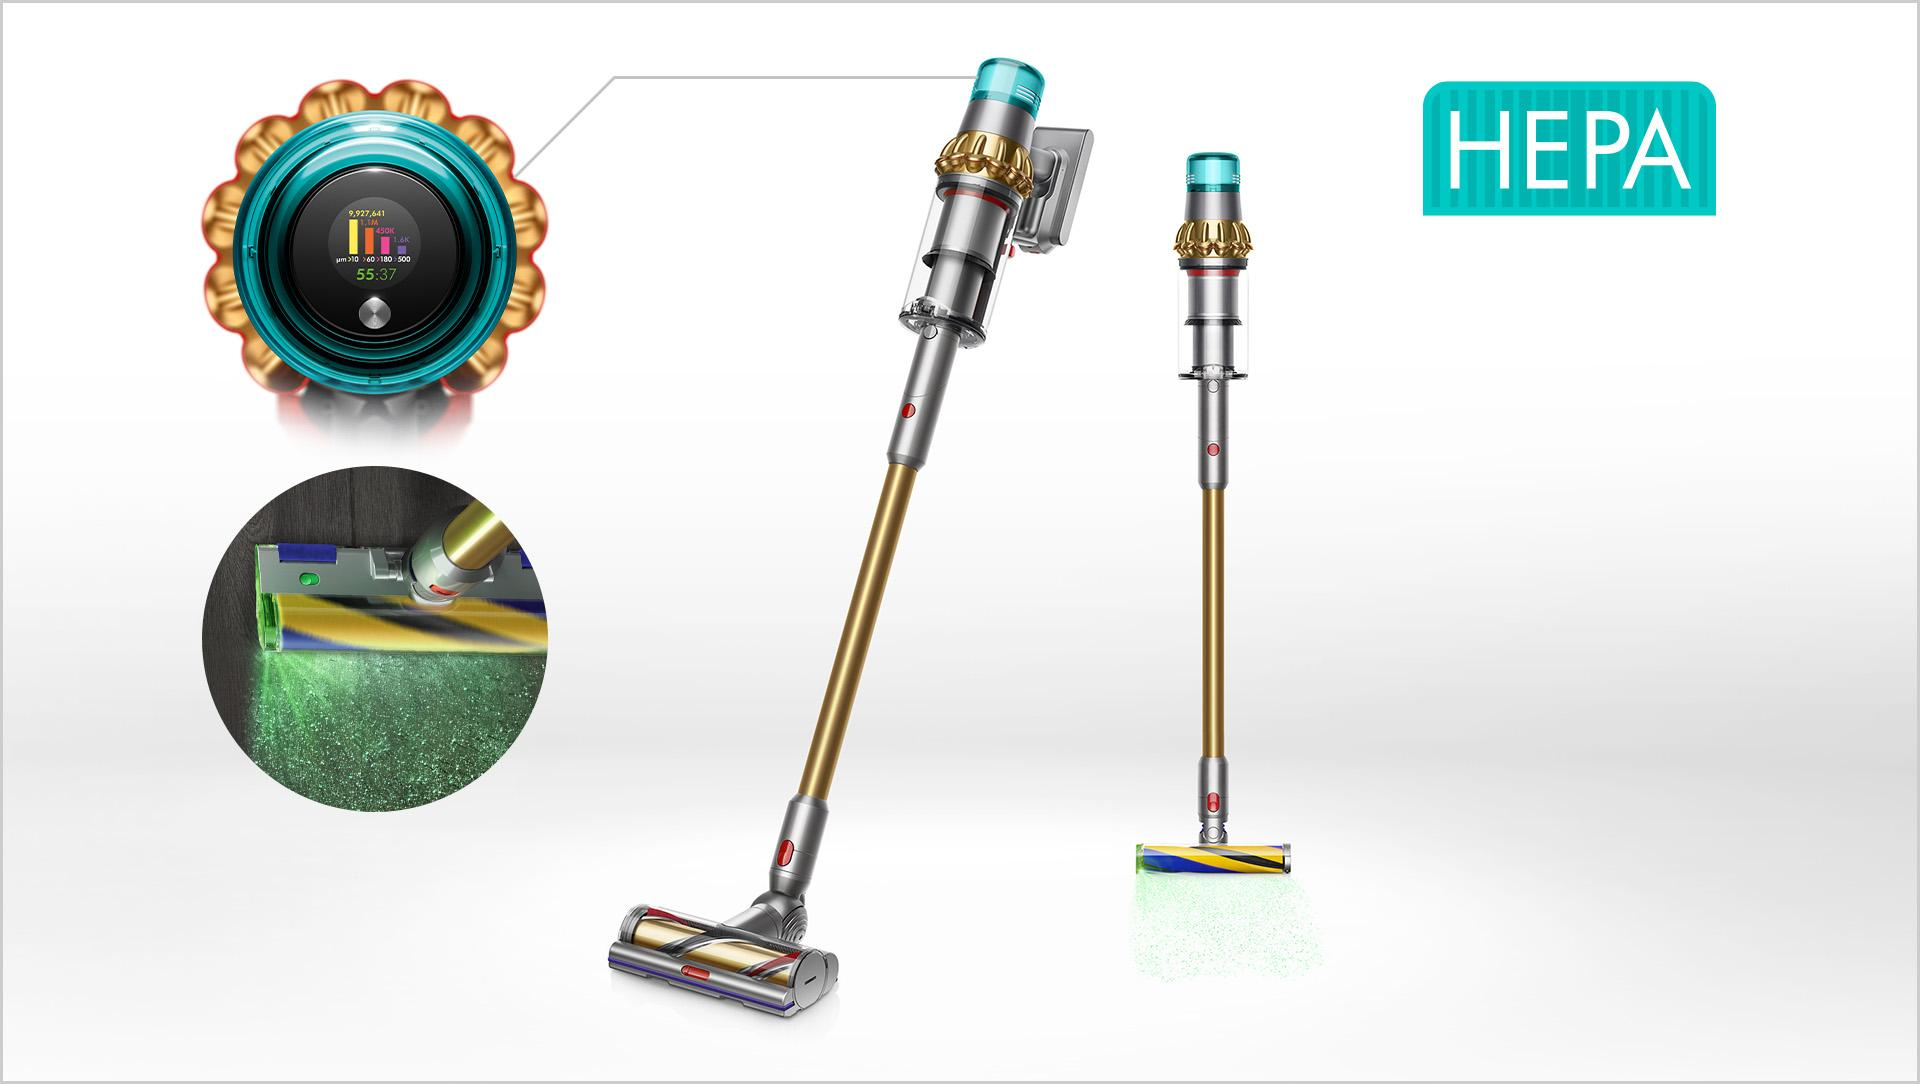 Dyson V15 Detect vacuum cleaner